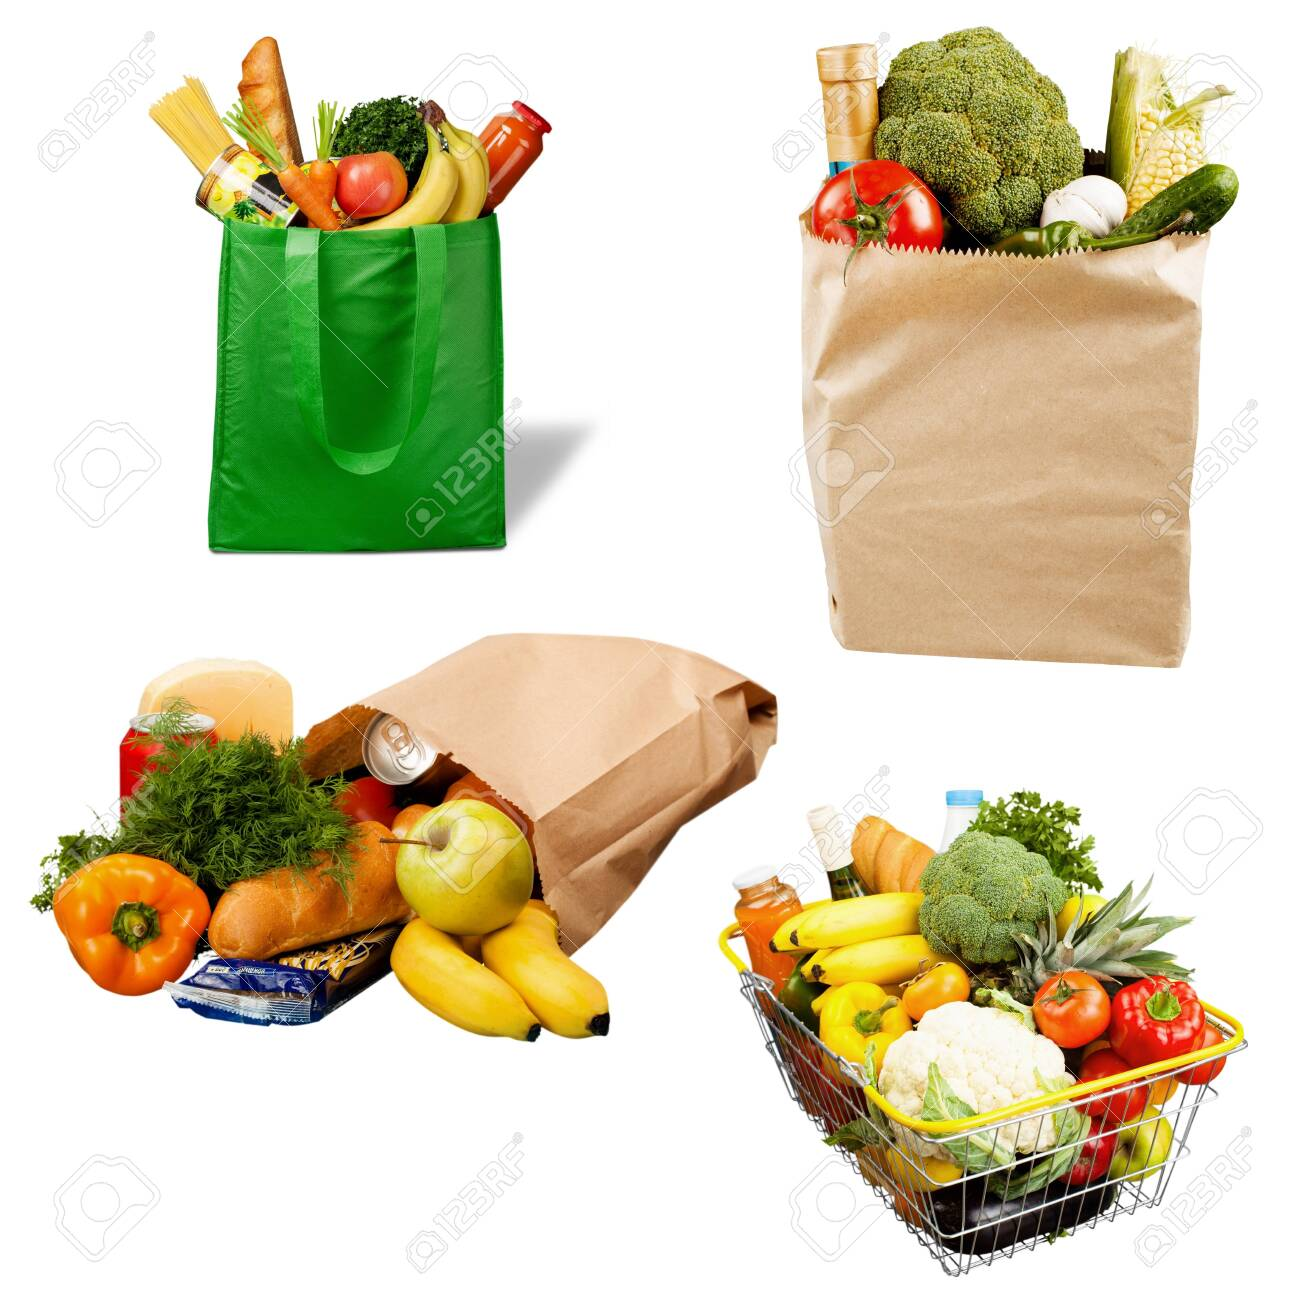 Full shopping bag, isolated over background - 130160040